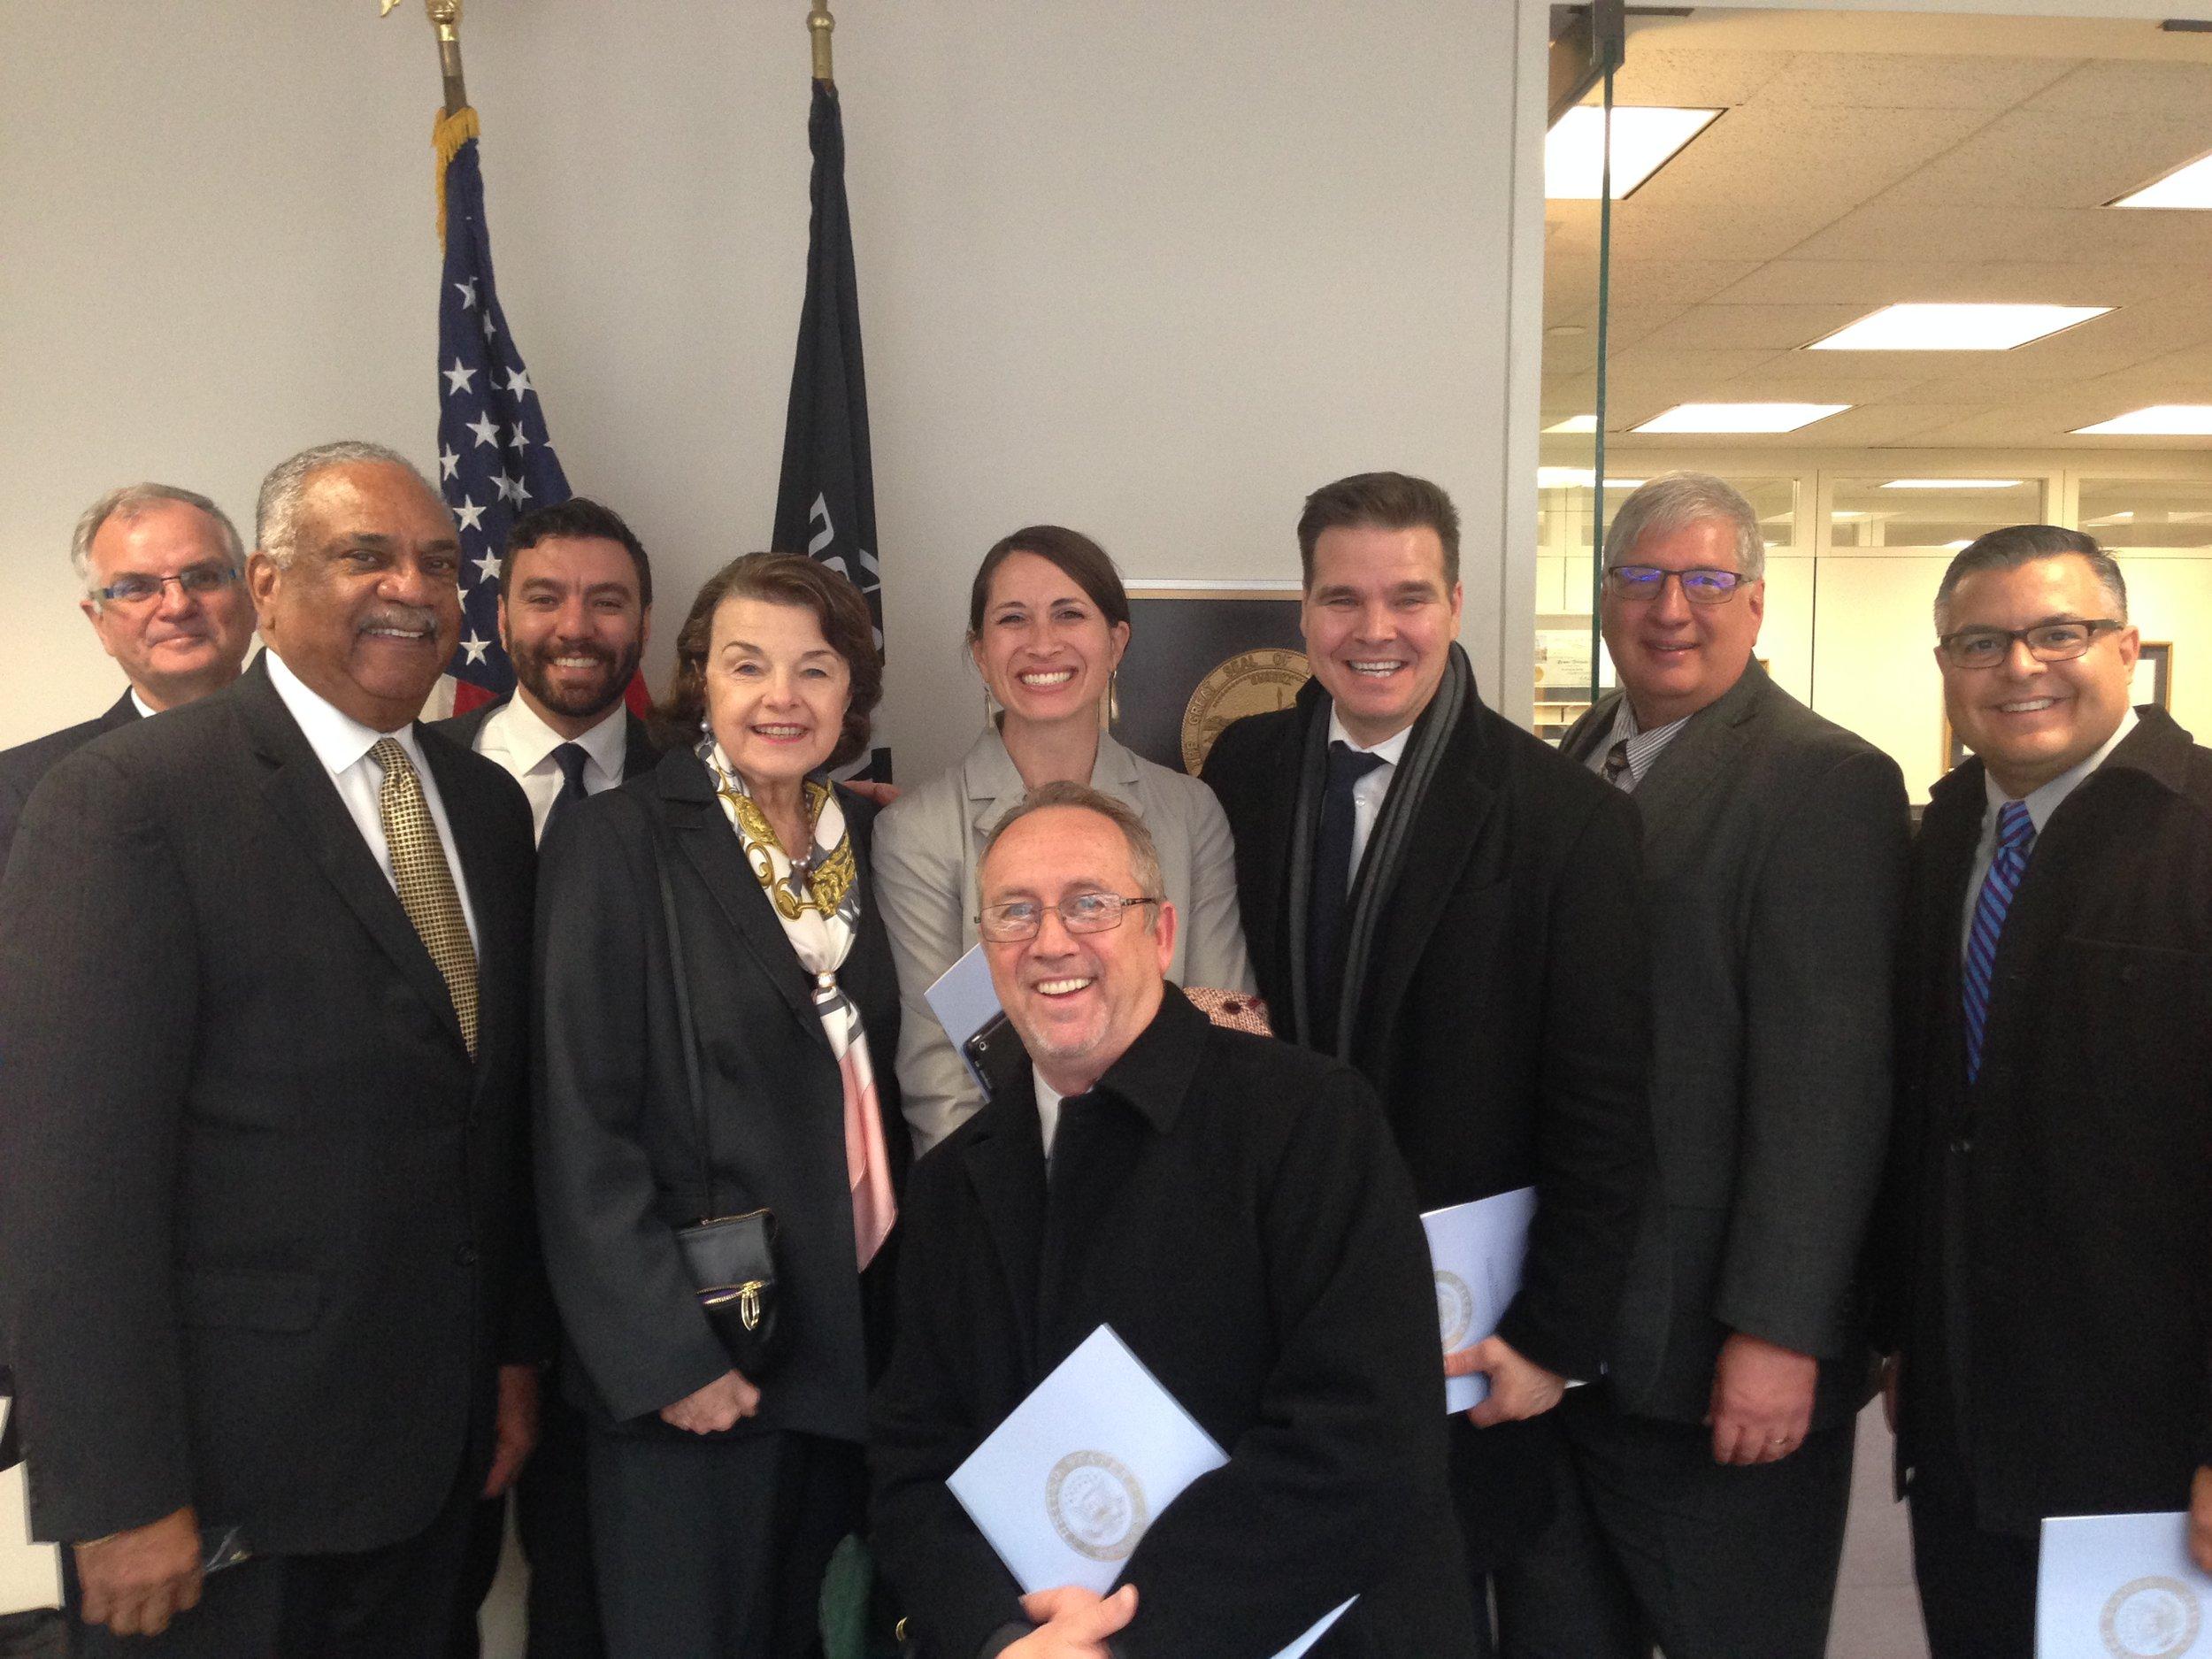 Senator Diane Feinstein and VRM staff, Kern County Mission, LA, and San Diego mission reps